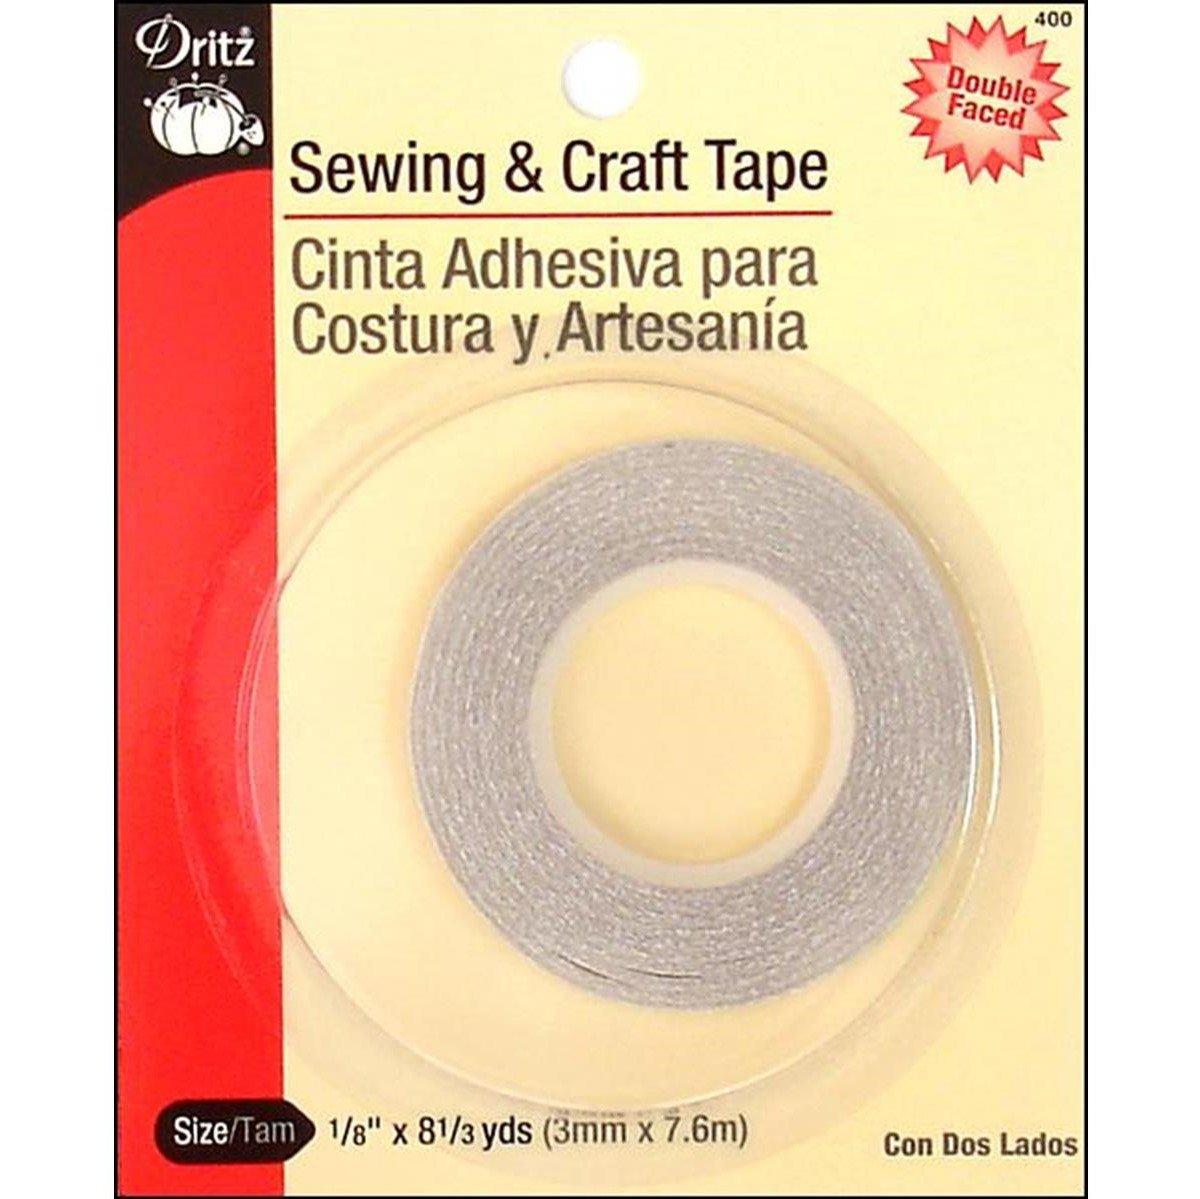 Dritz - Doube Faces Basting Tape - 0.125in x 8.375yds - DRI400